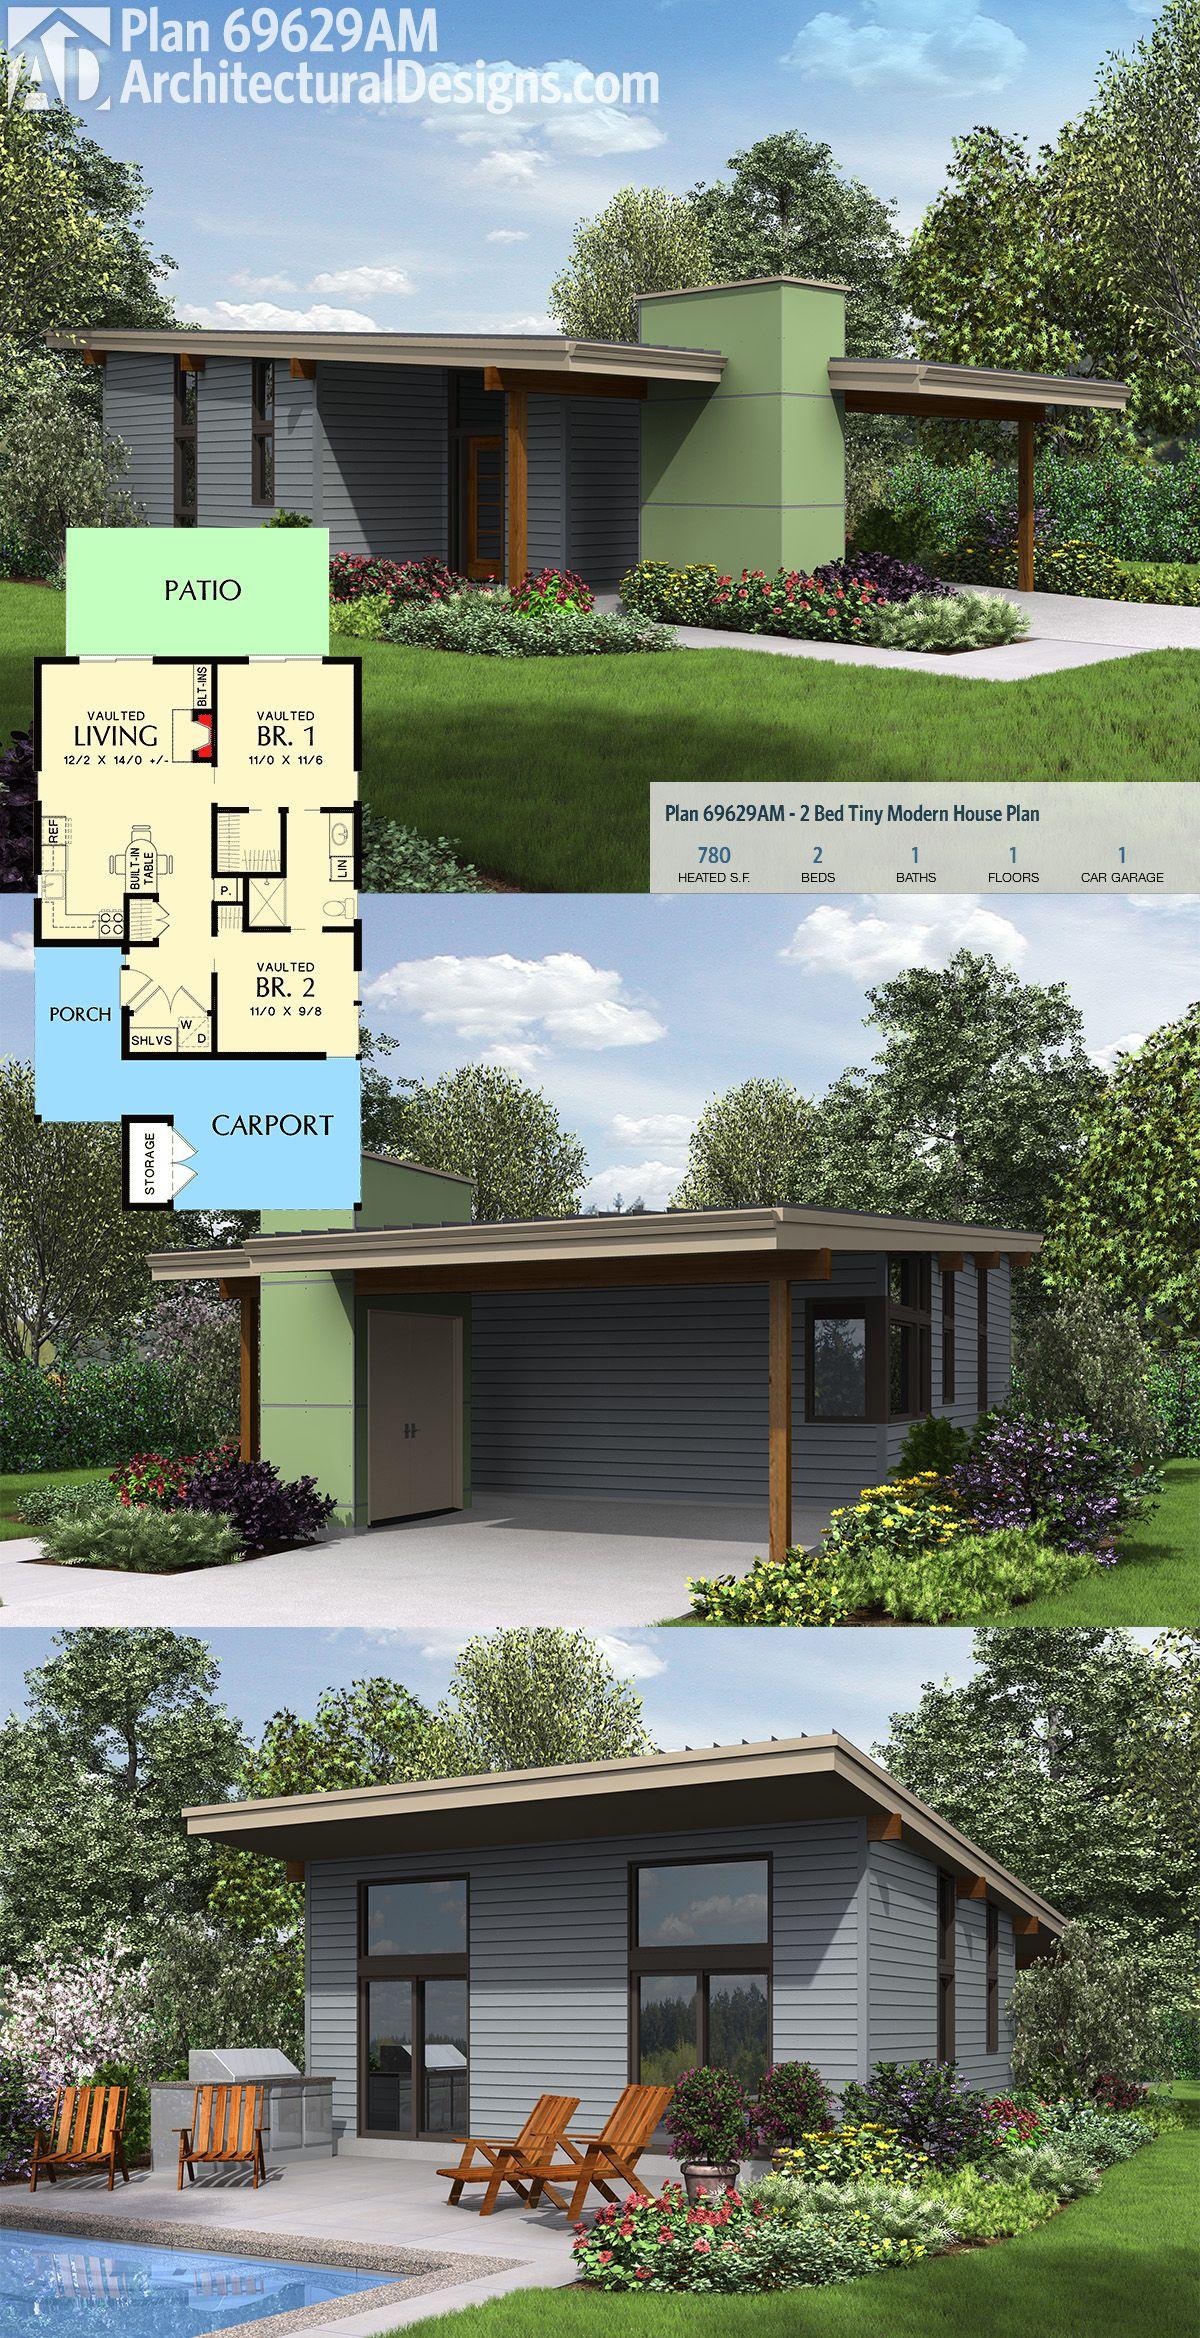 plan 69629am tiny 2 bed modern house plan modern house plans